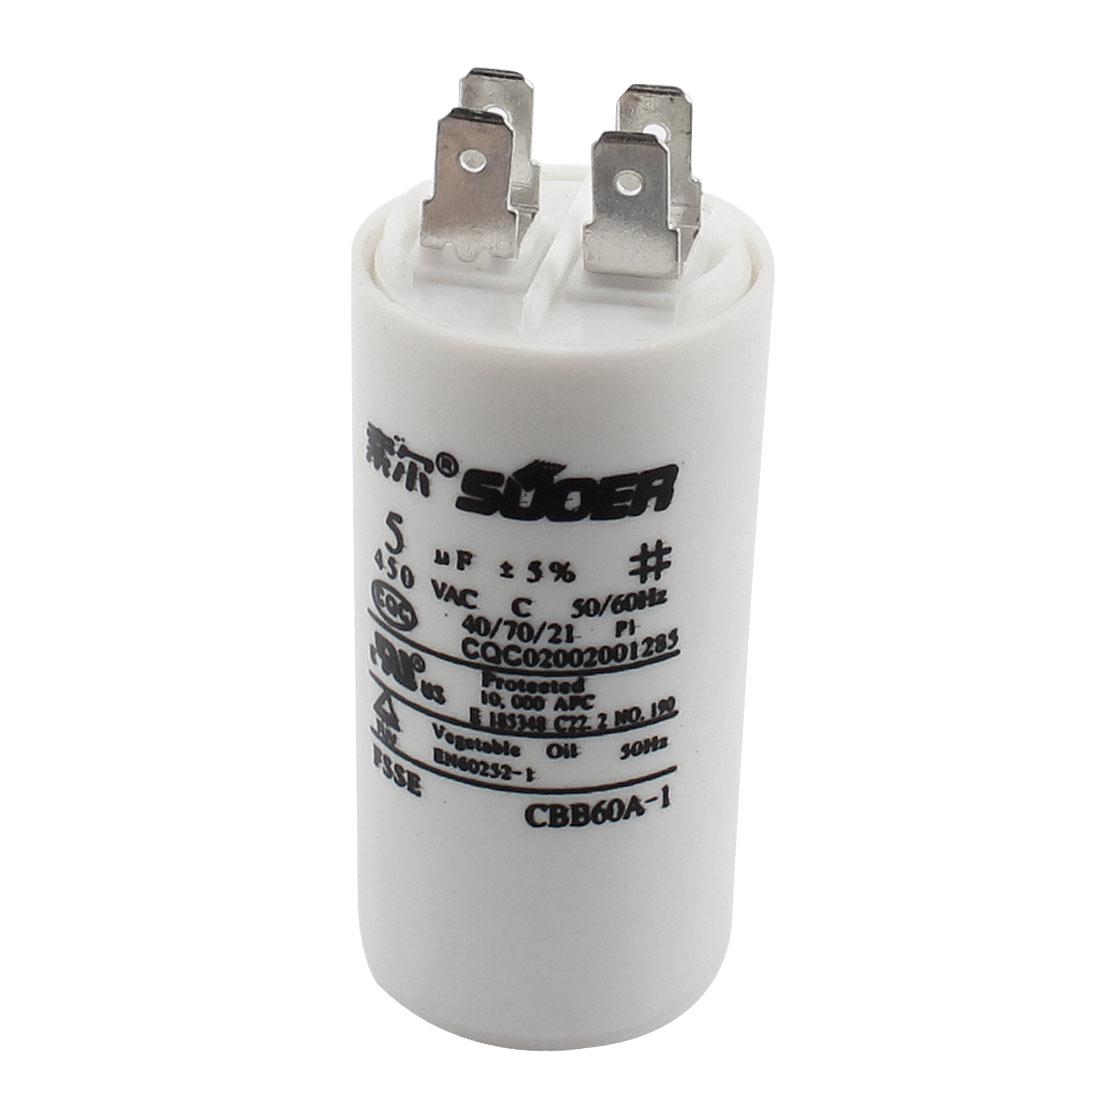 AC450V 5uF 5% Tolerance 4-Pin Cylinder Polypropylene Film Washing Machine Motor Run Capacitor White